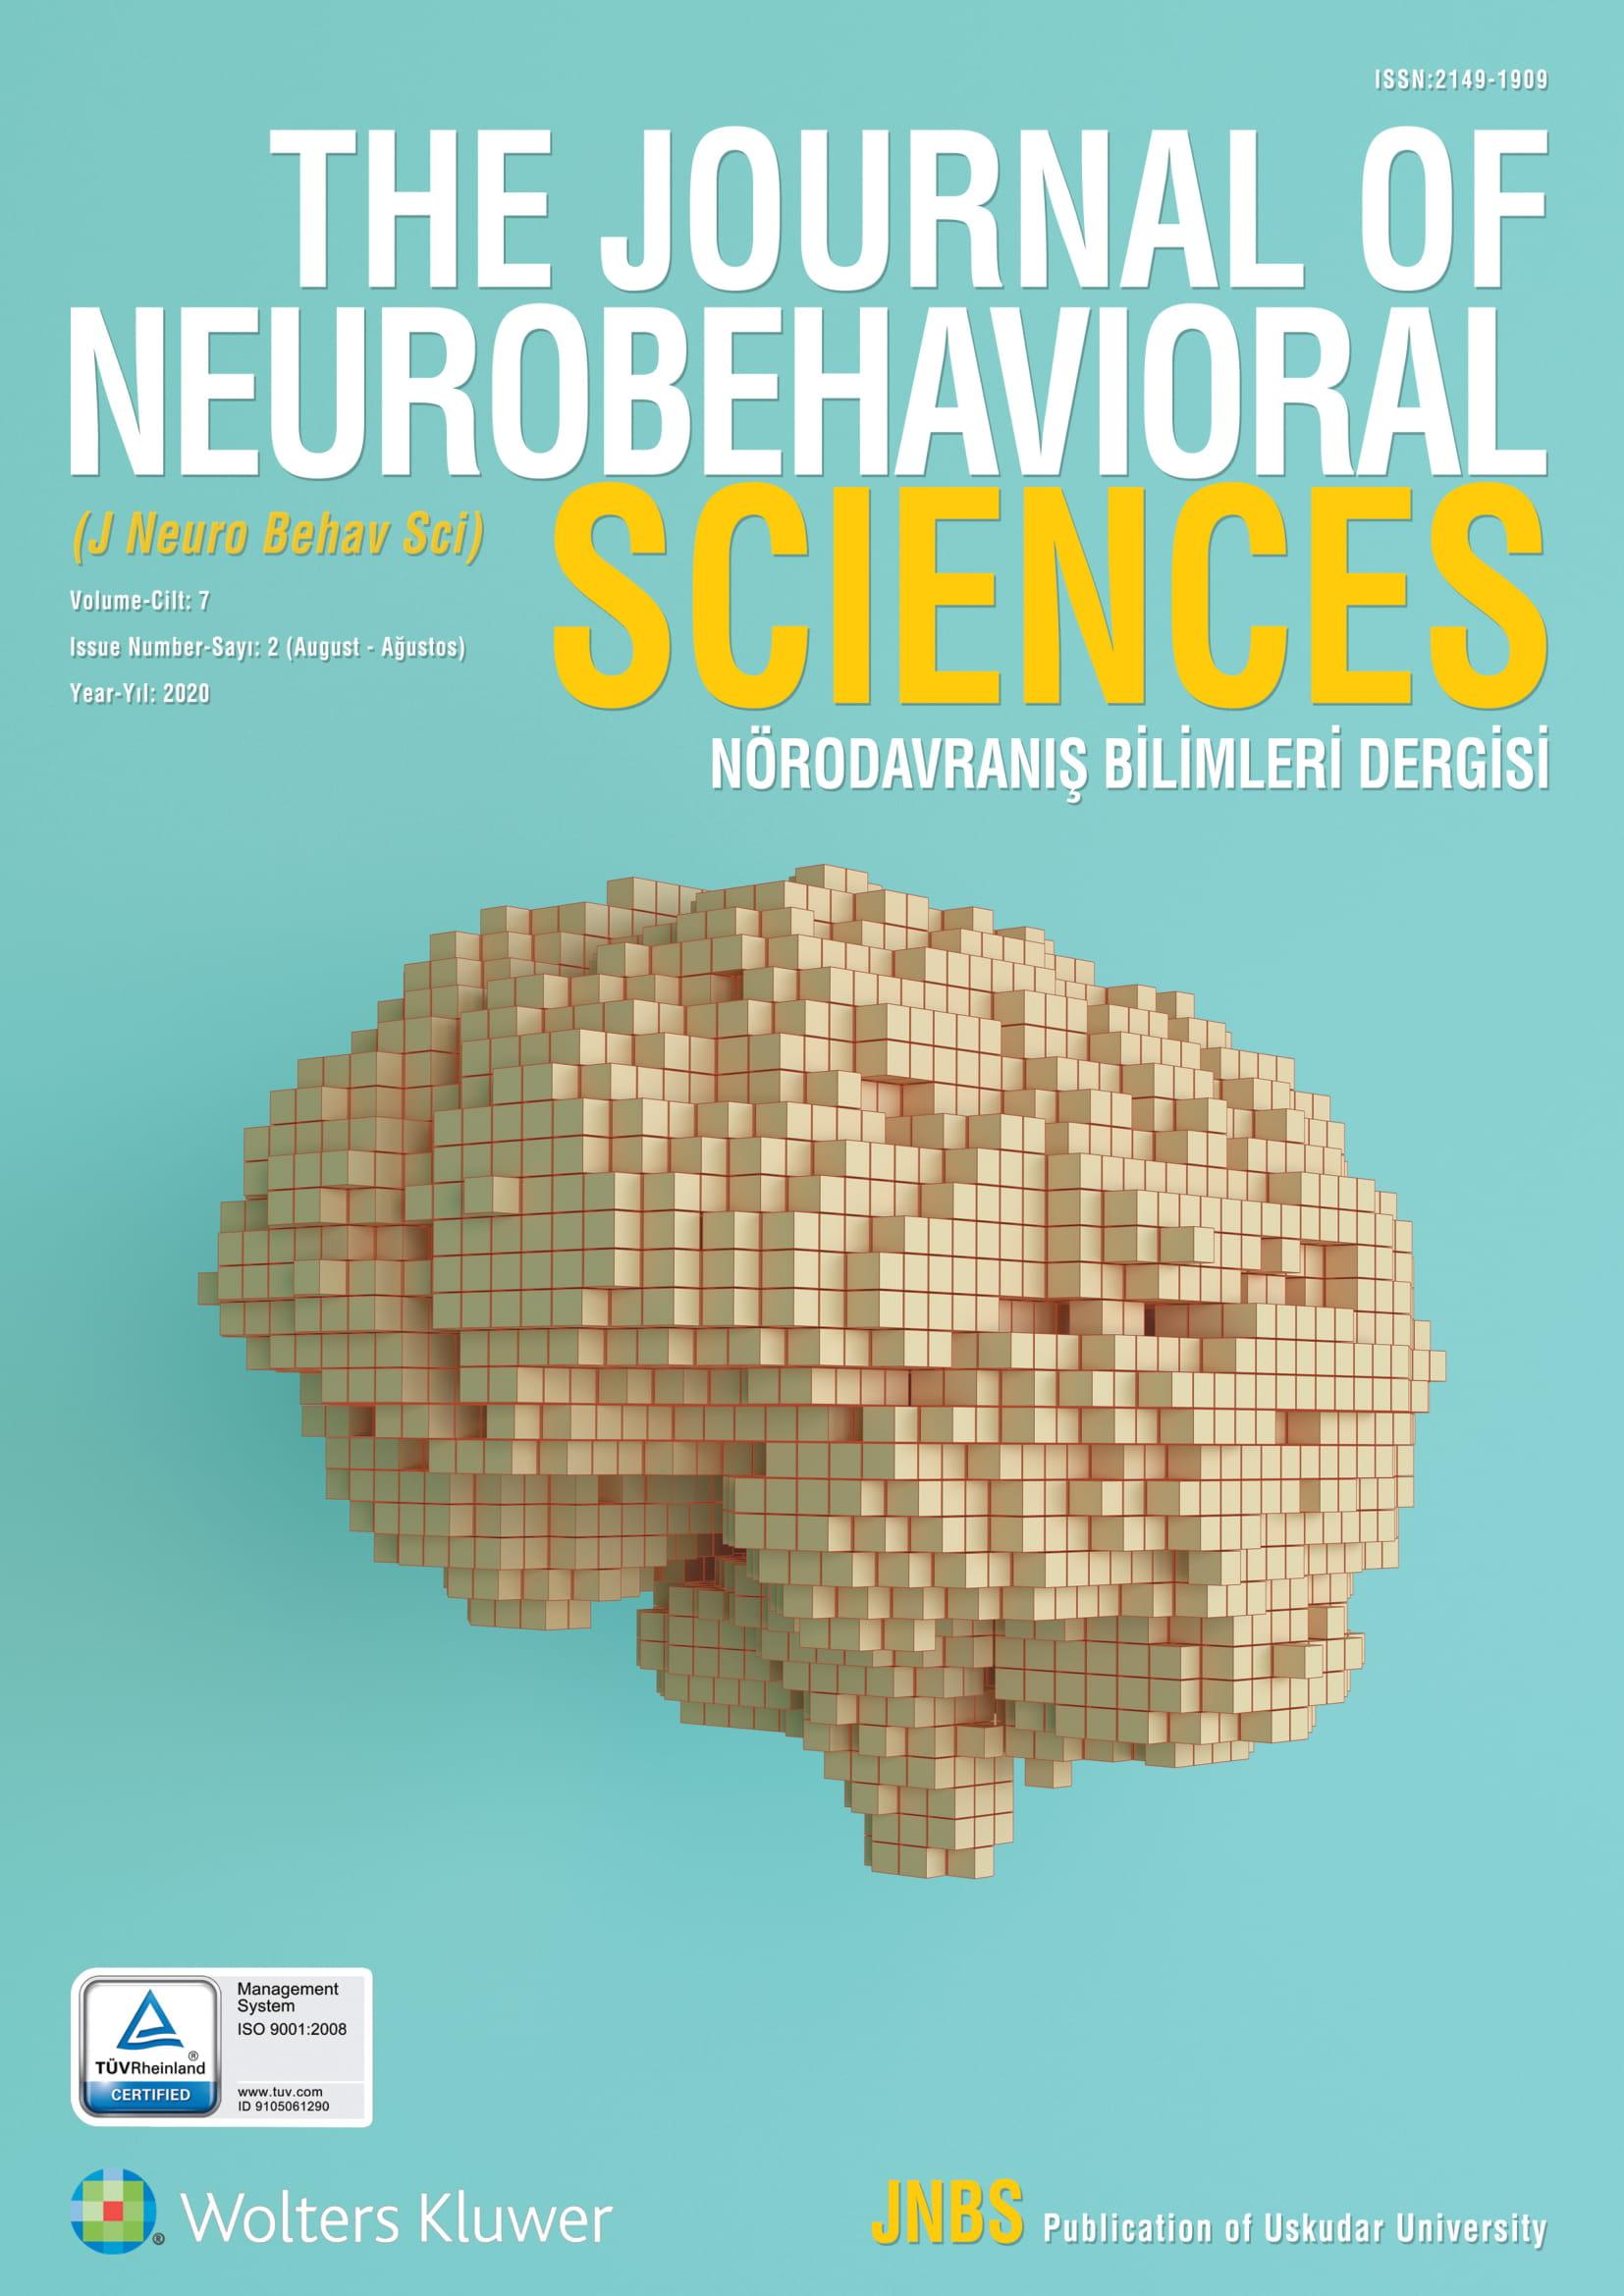 The Journal of Neurobehavioral Sciences-Asos İndeks